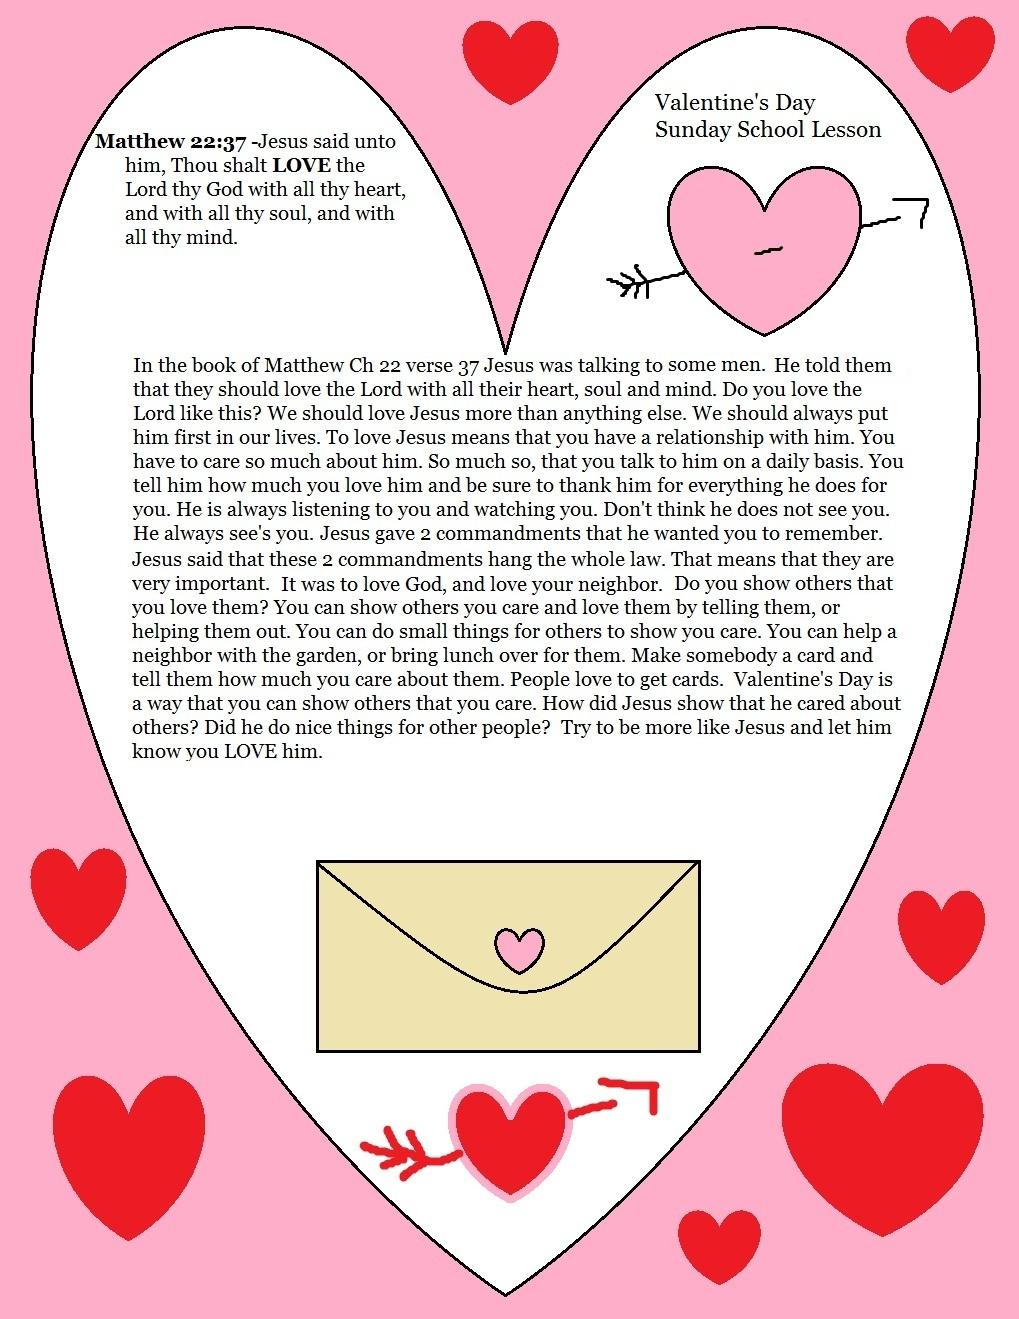 matthew 2237 kjv - Valentine Sunday School Lesson